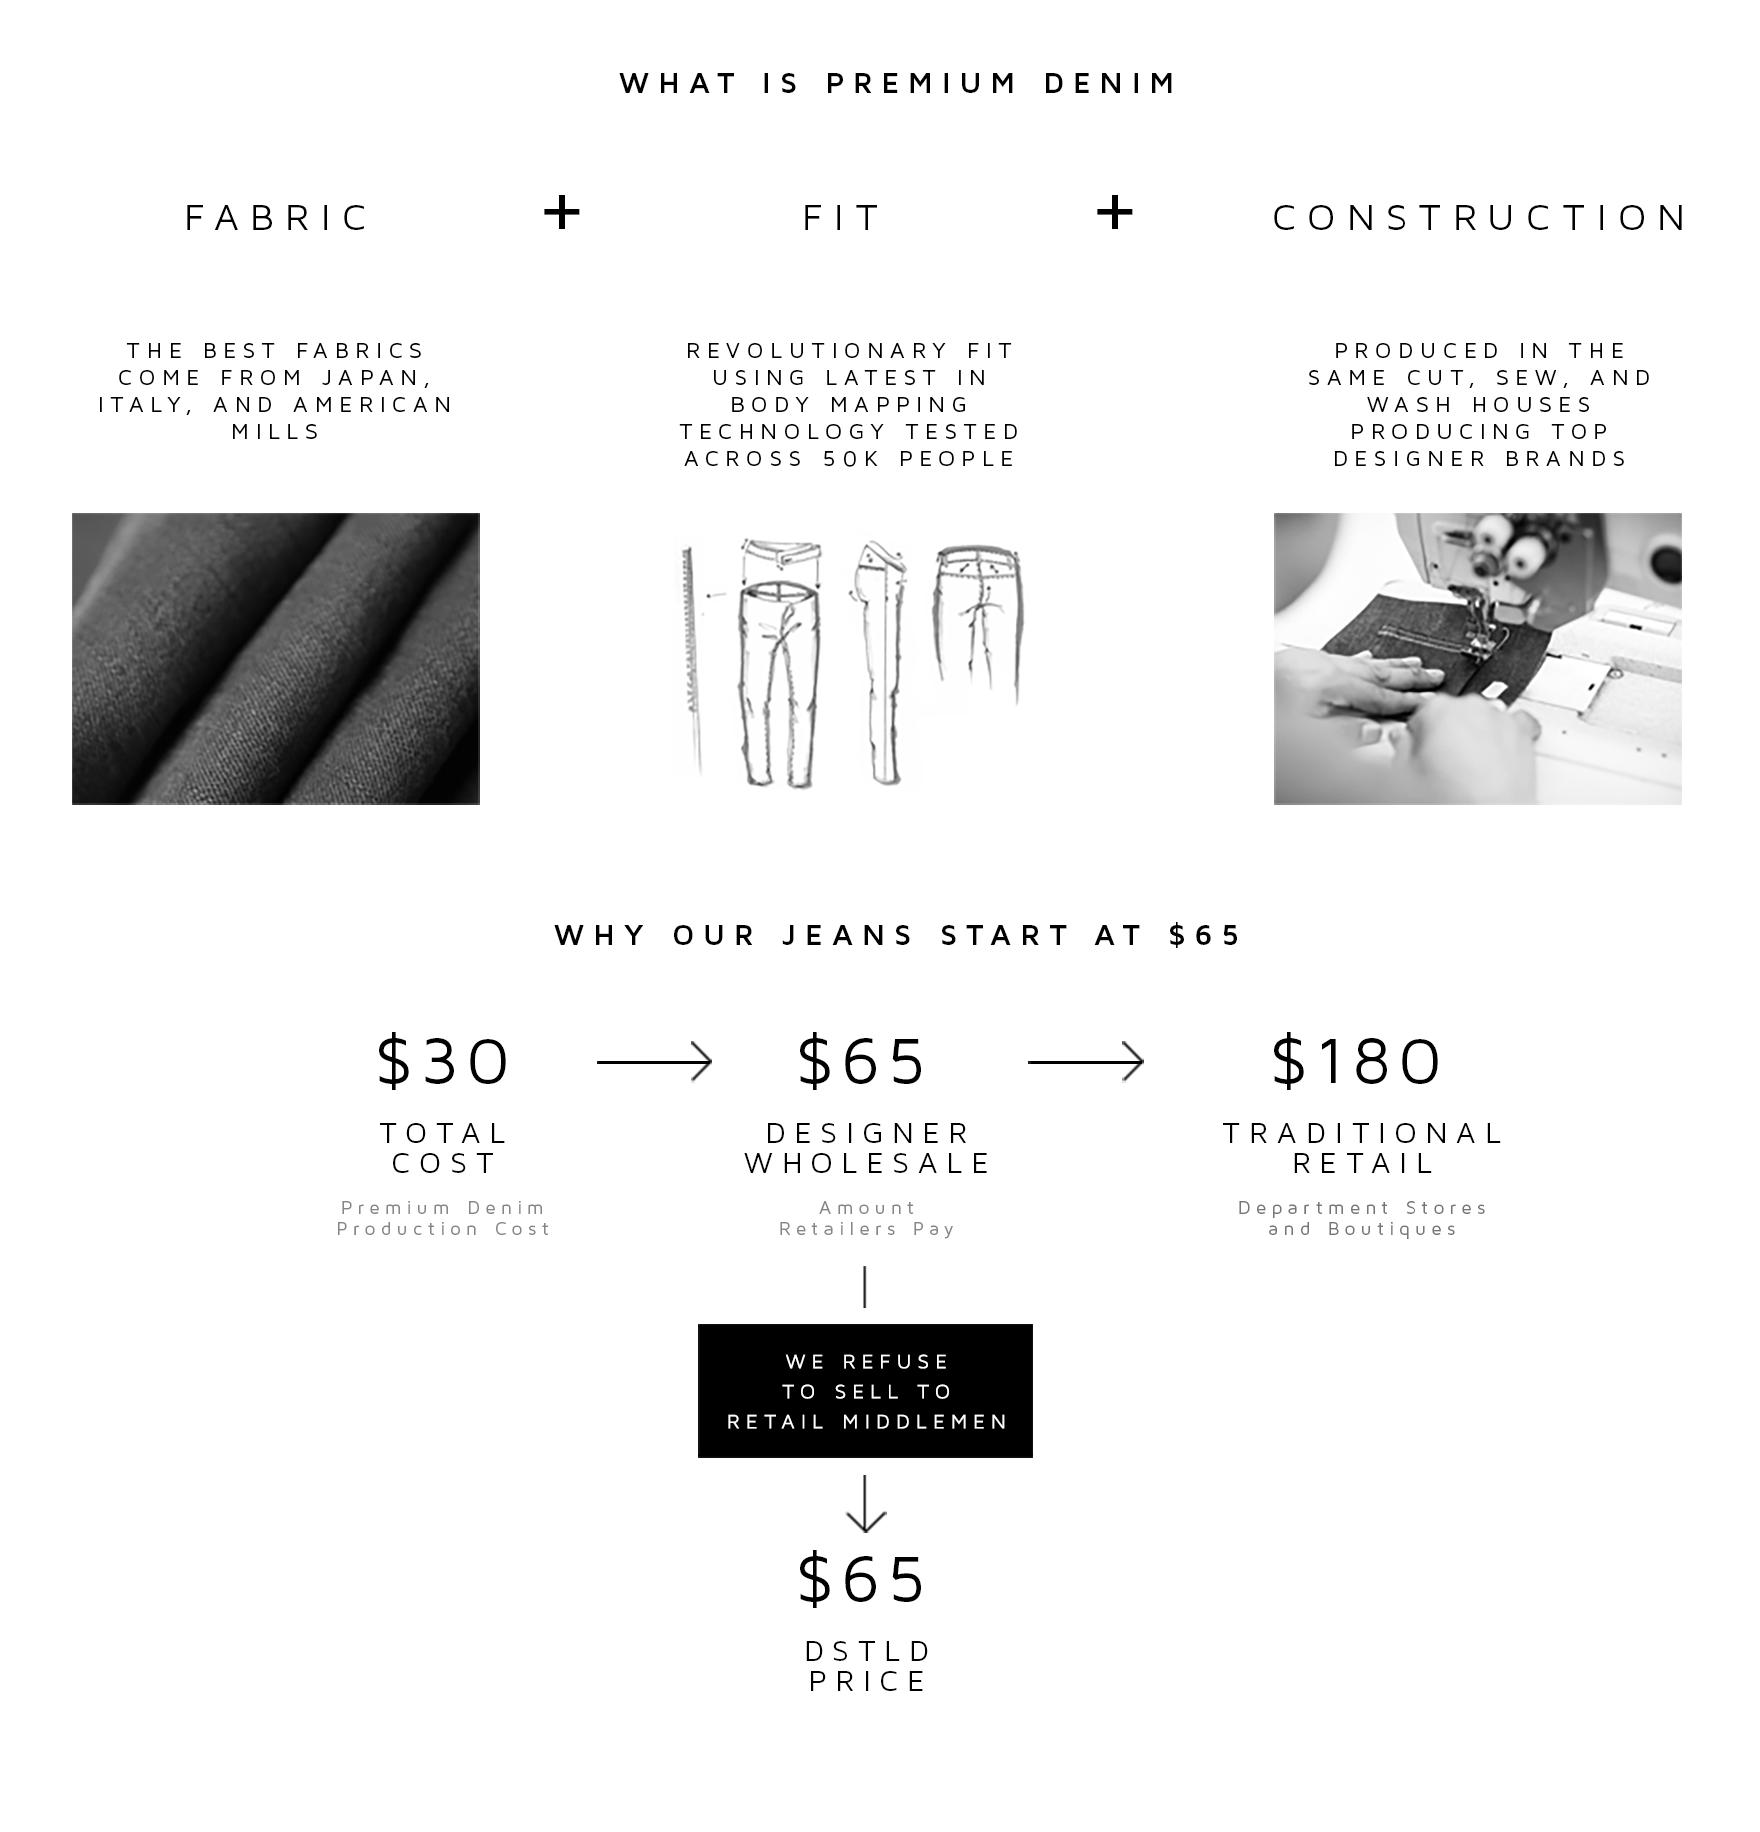 DSTLD - Low Rise Skinny Jeans in Overdye | DSTLD Jeans | Luxe Denim from $65